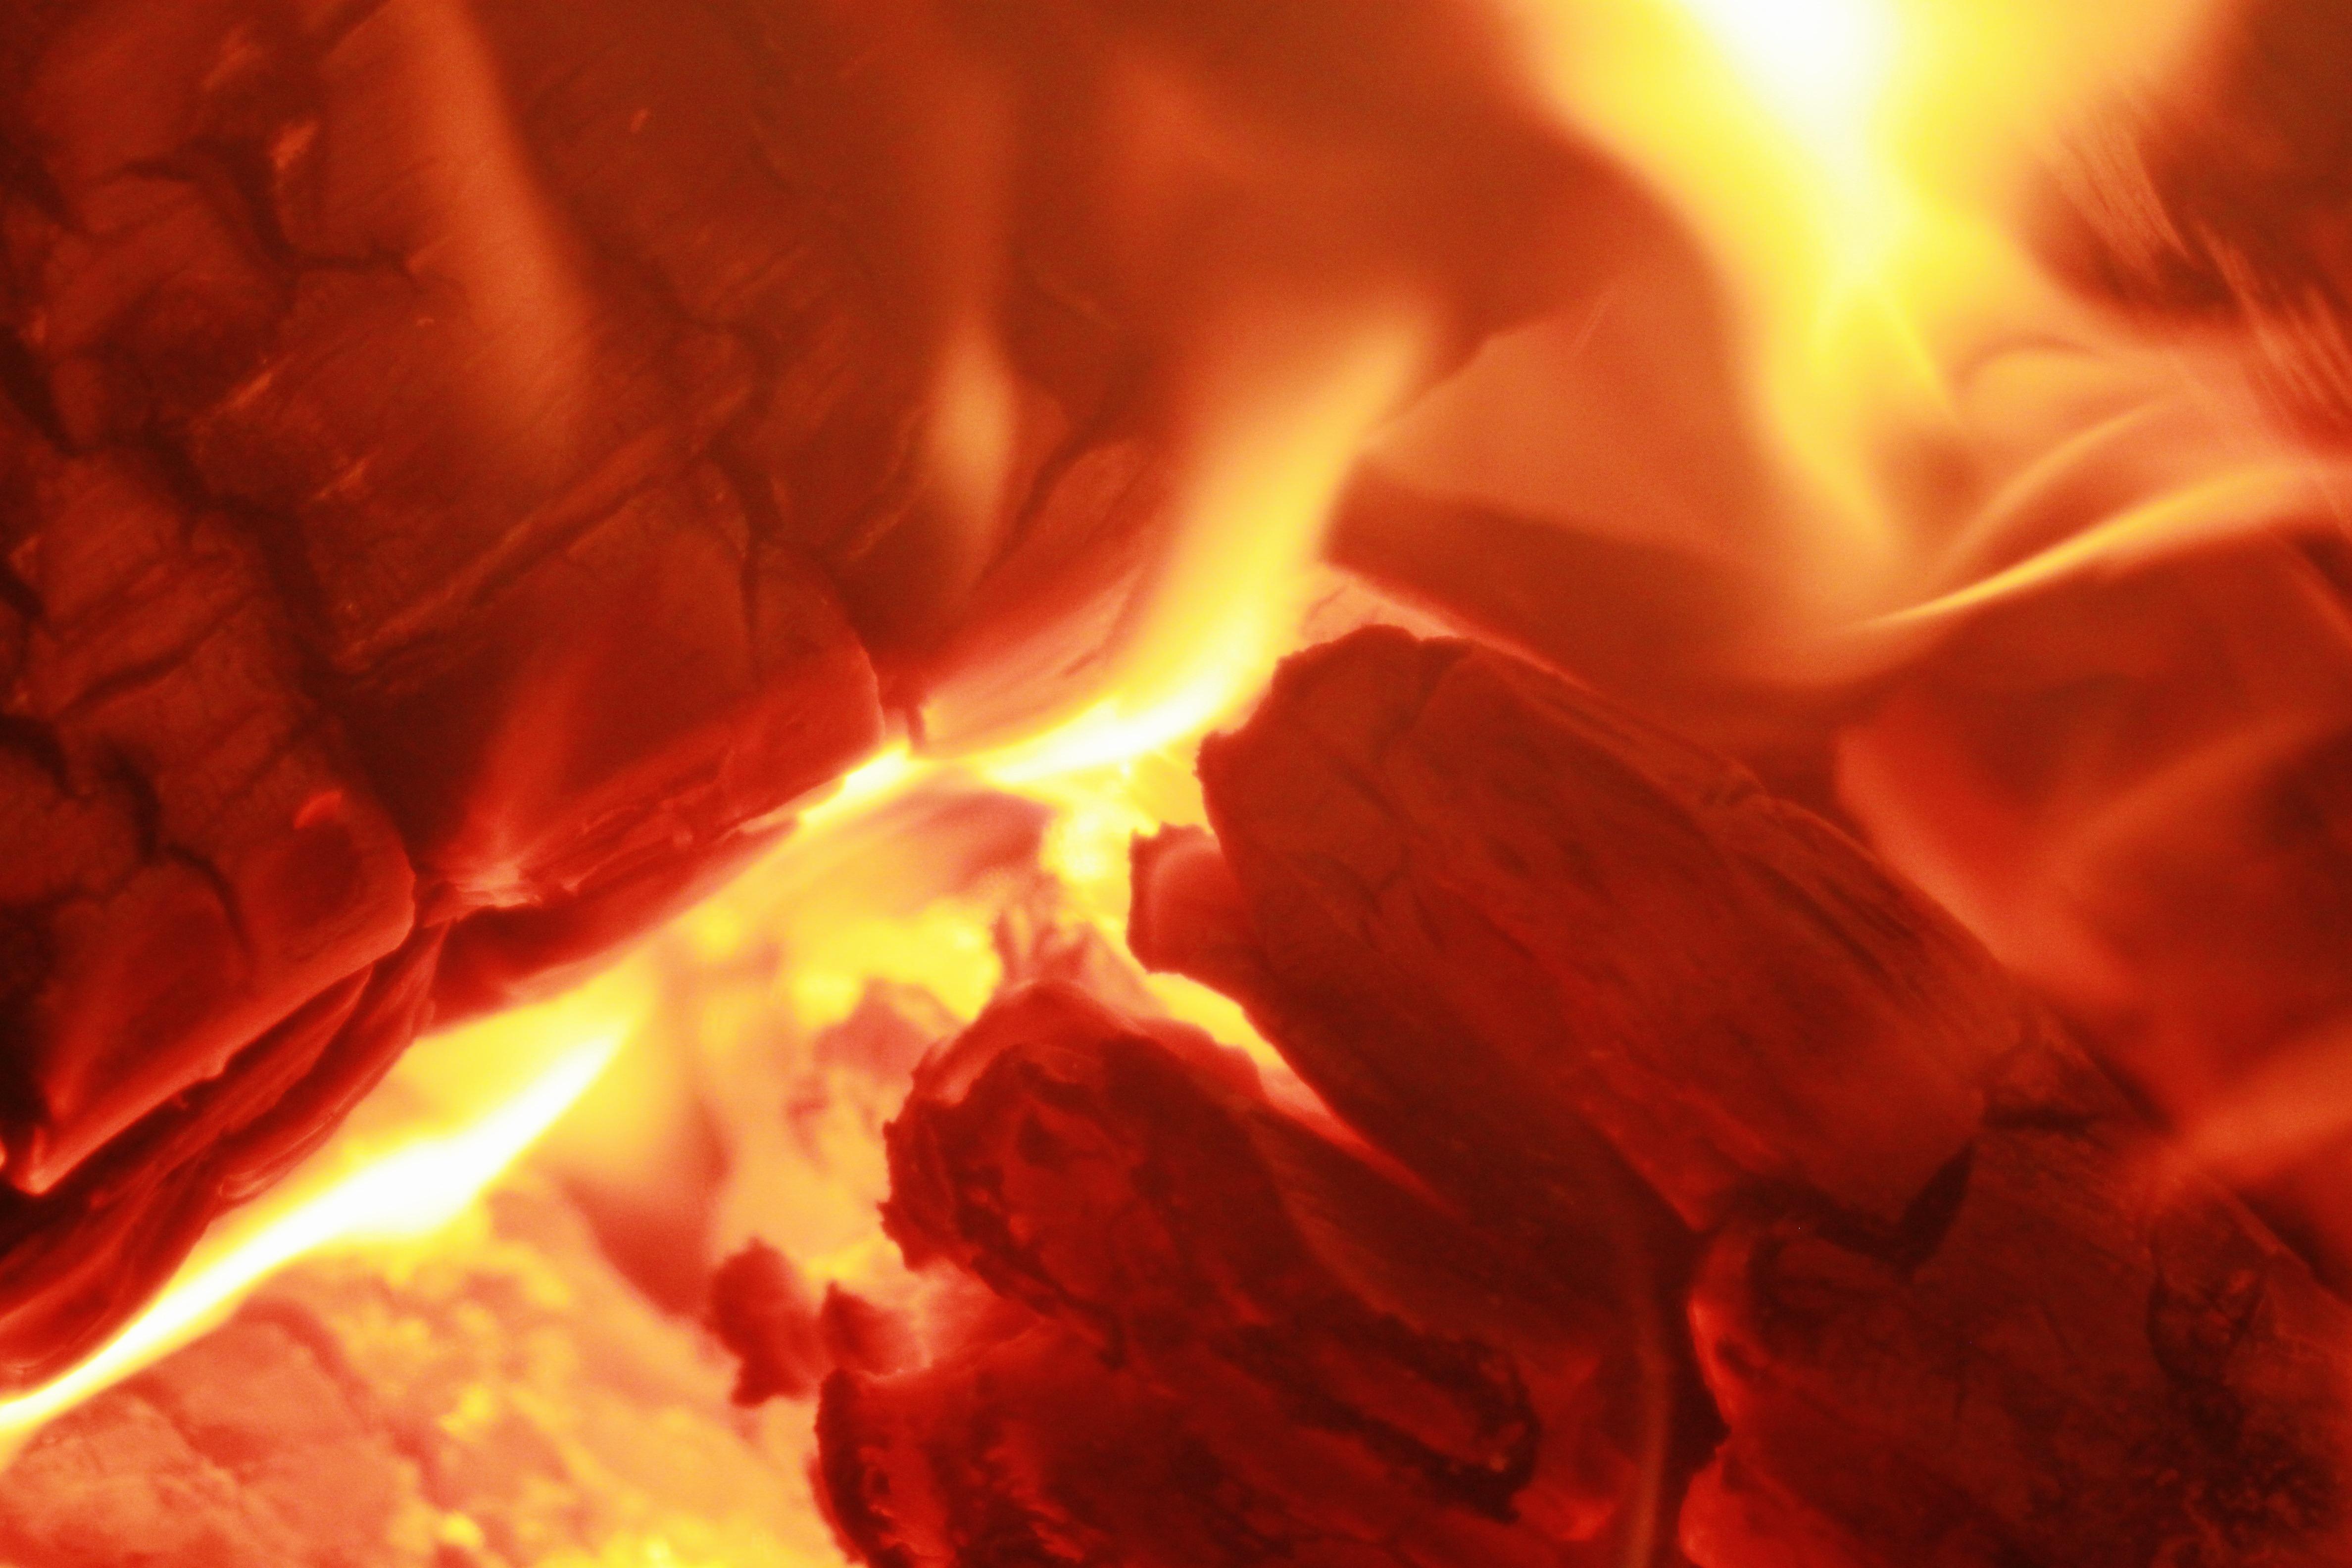 Fotos gratis : textura, rojo, llama, chimenea, calor ...